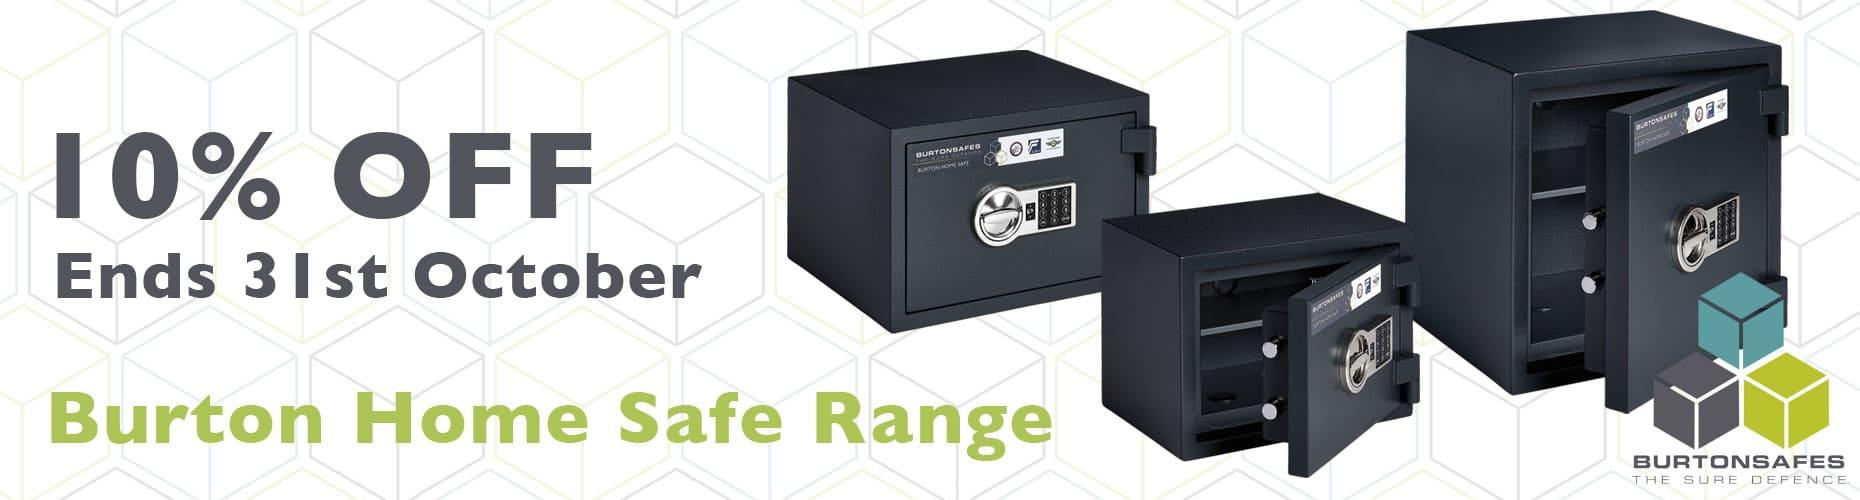 Eurograde 0 Safes - £6,000